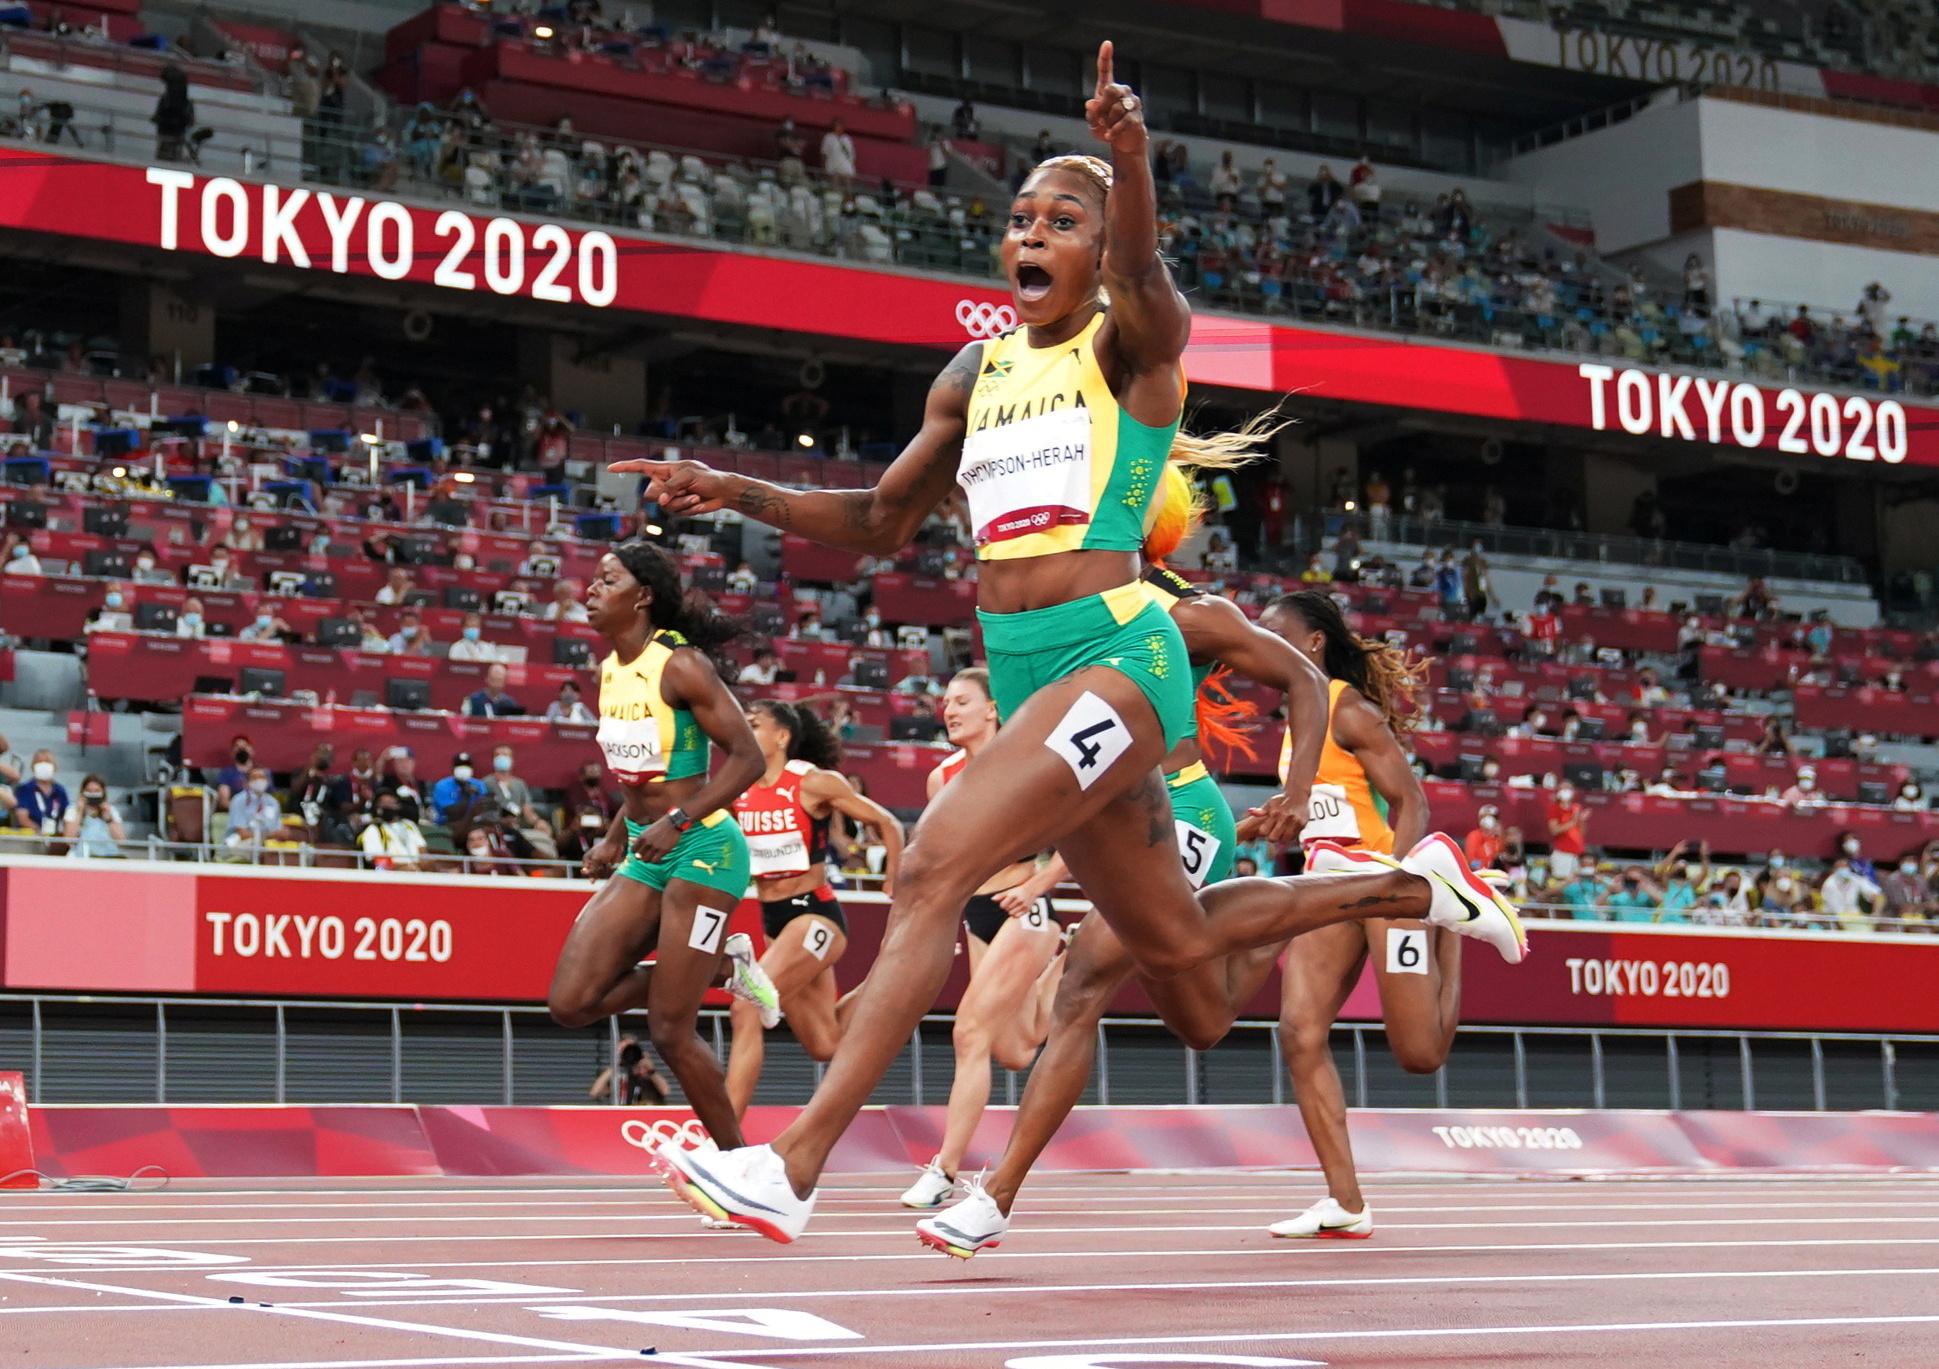 Tokyo 2020 Olympics - Athletics - Women's 100m - Final - OLS - Olympic Stadium, Tokyo, Japan - July 31, 2021. Elaine Thompson-Herah of Jamaica crosses the finish line first to win the gold medal REUTERS/Pawel Kopczynski